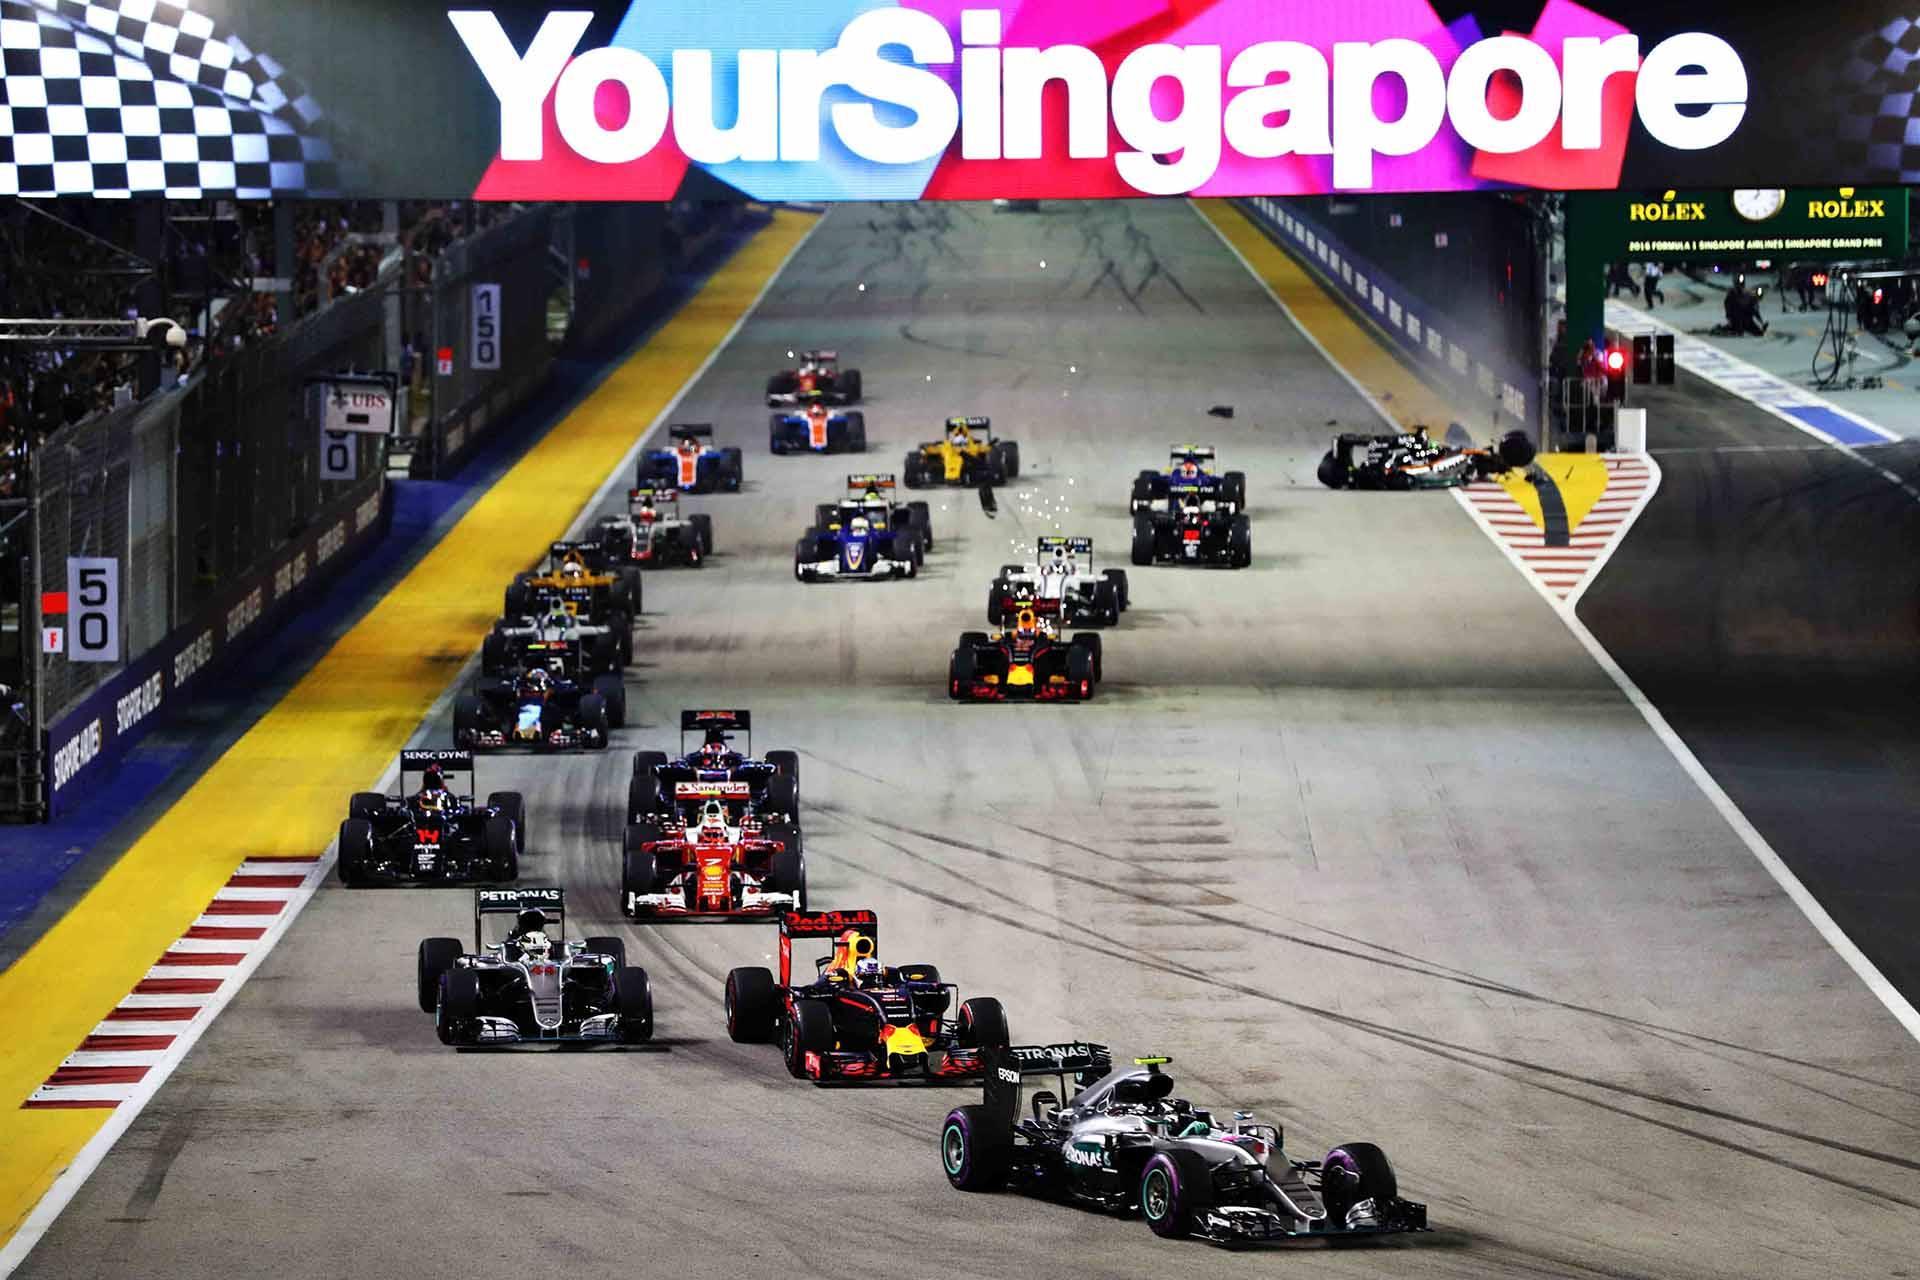 nico rosberg mercedes amg petronas f1 formula 1 formula one singapore grand prix f1 singapore grand prix pic1